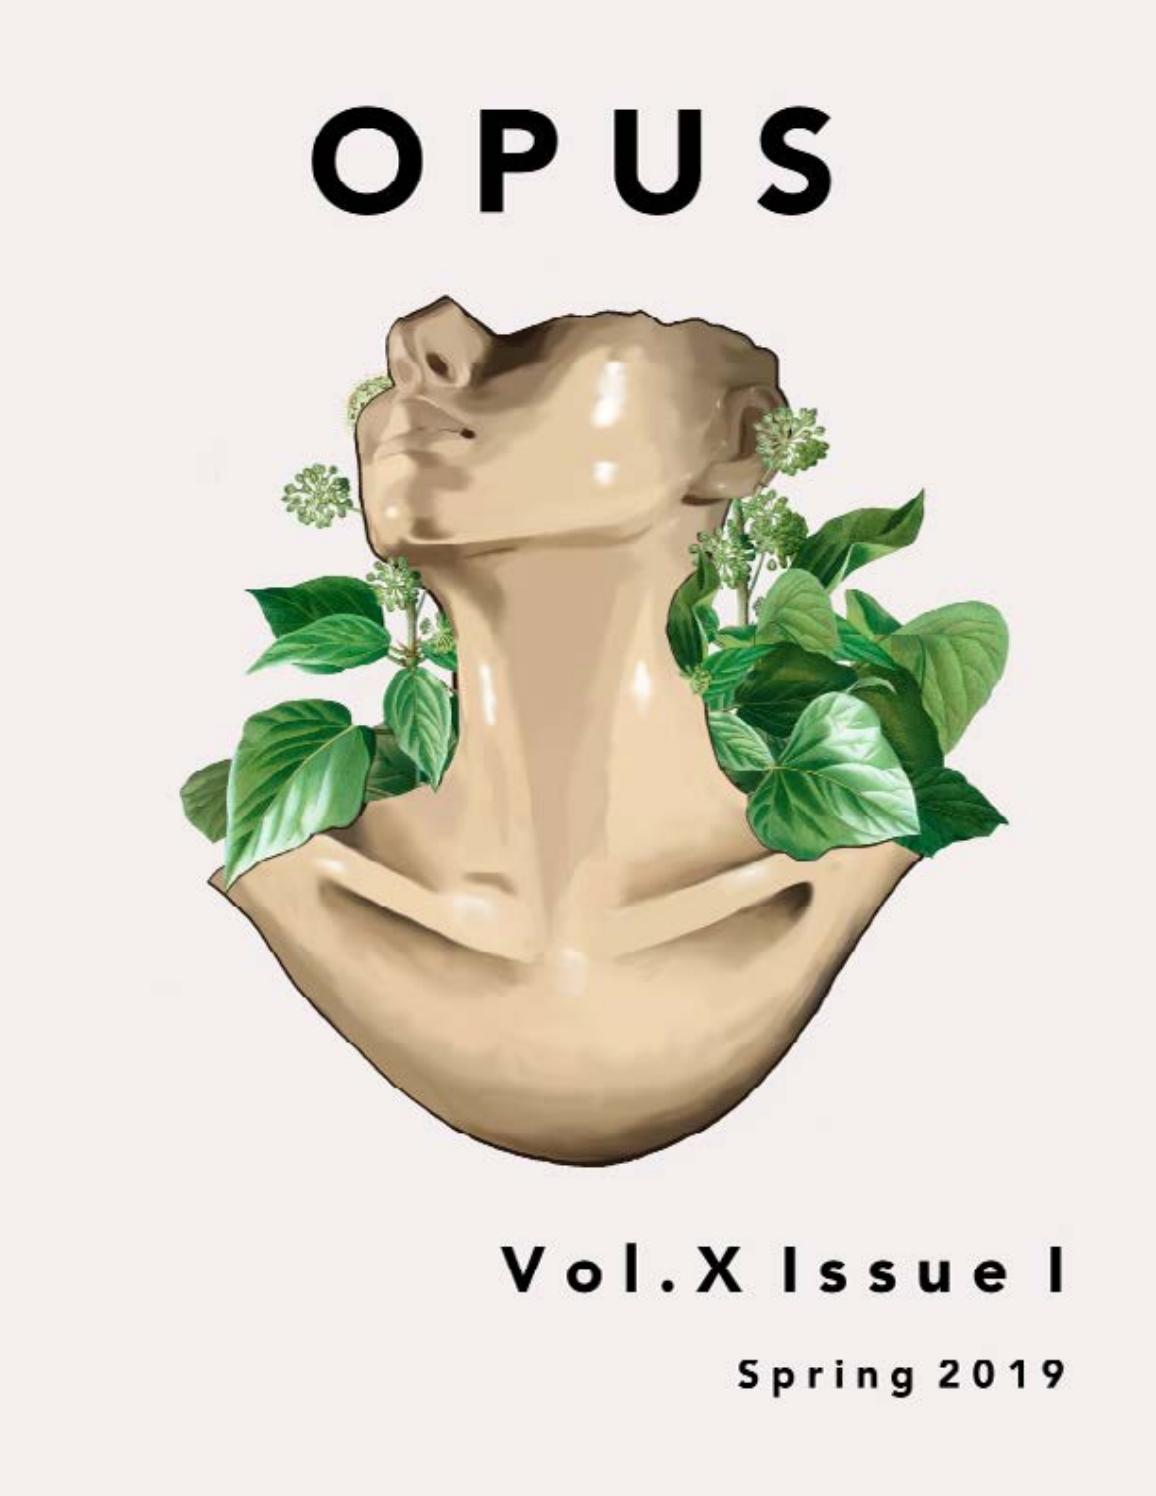 Anastasia Devine Wiki nyu opus vol. x issue i | spring 2019nyu applied